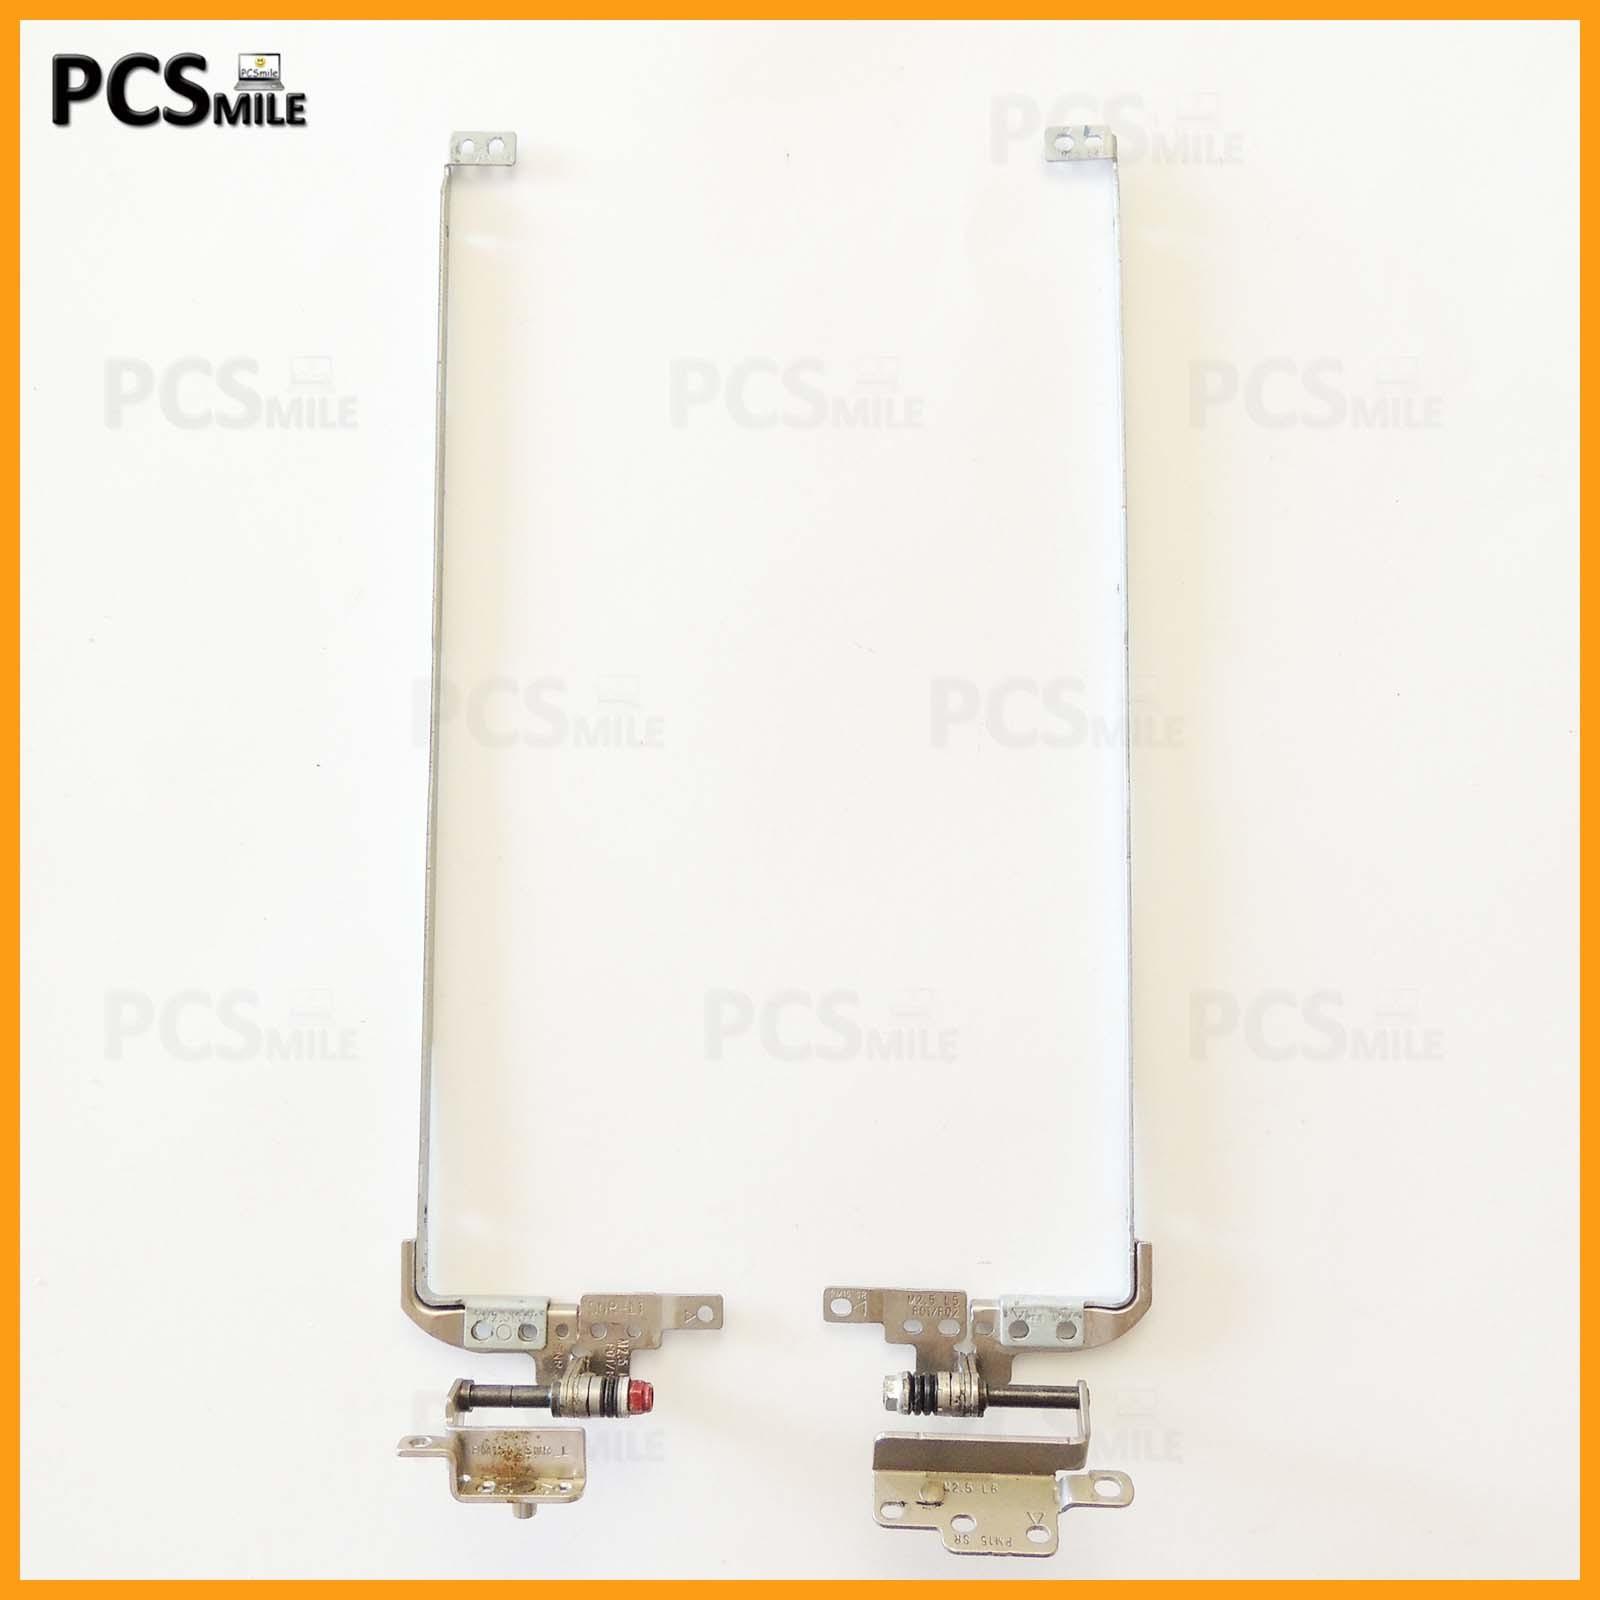 Cerniere HP G62-b06SL supporto LCD 1A01EQ700-HT4-G 1A01EQ800-GGS-G